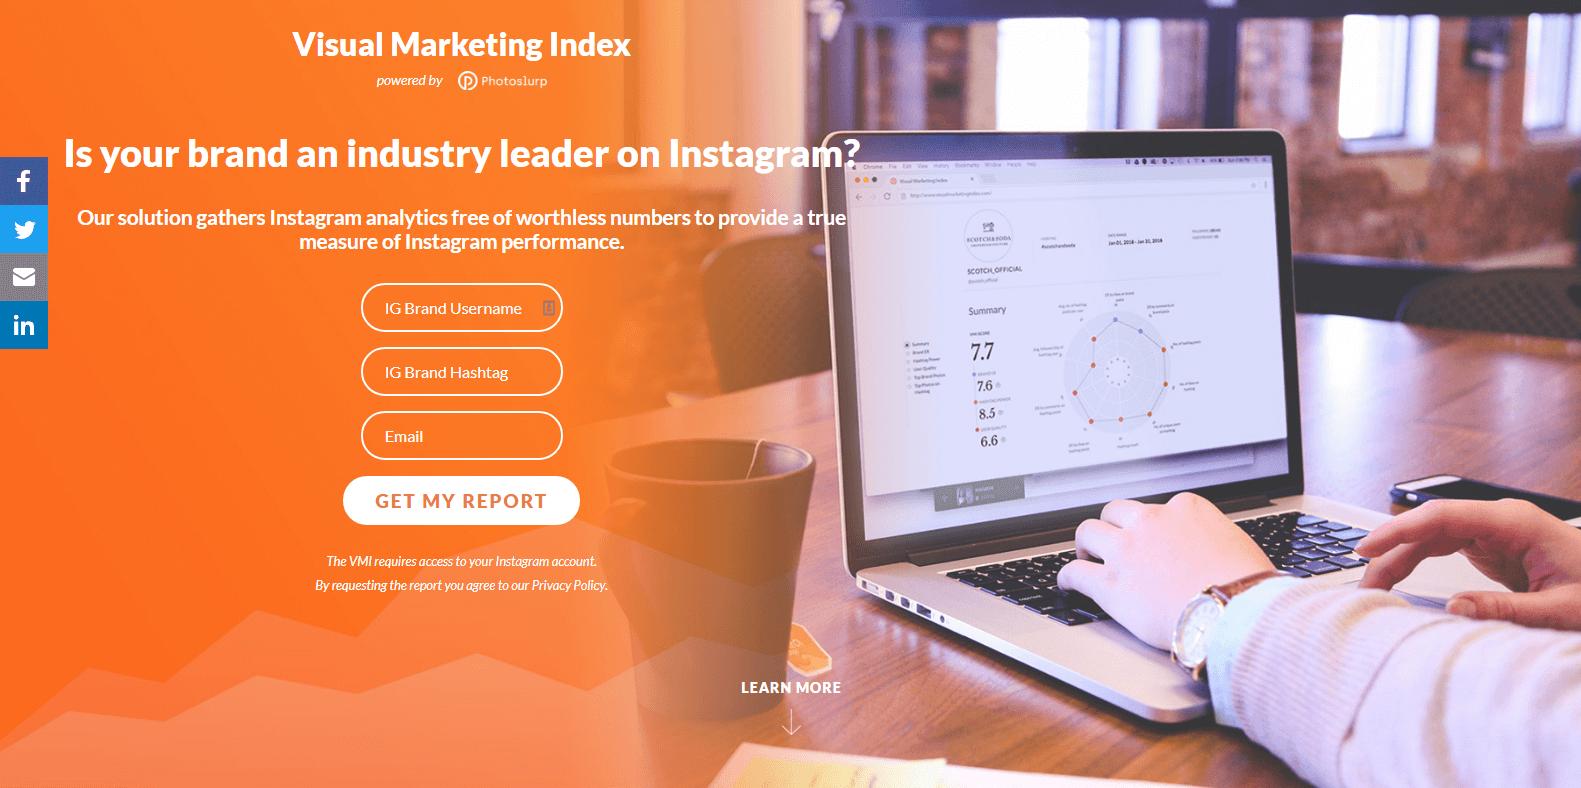 Visual Marketing Index Instagram Analytics Tools